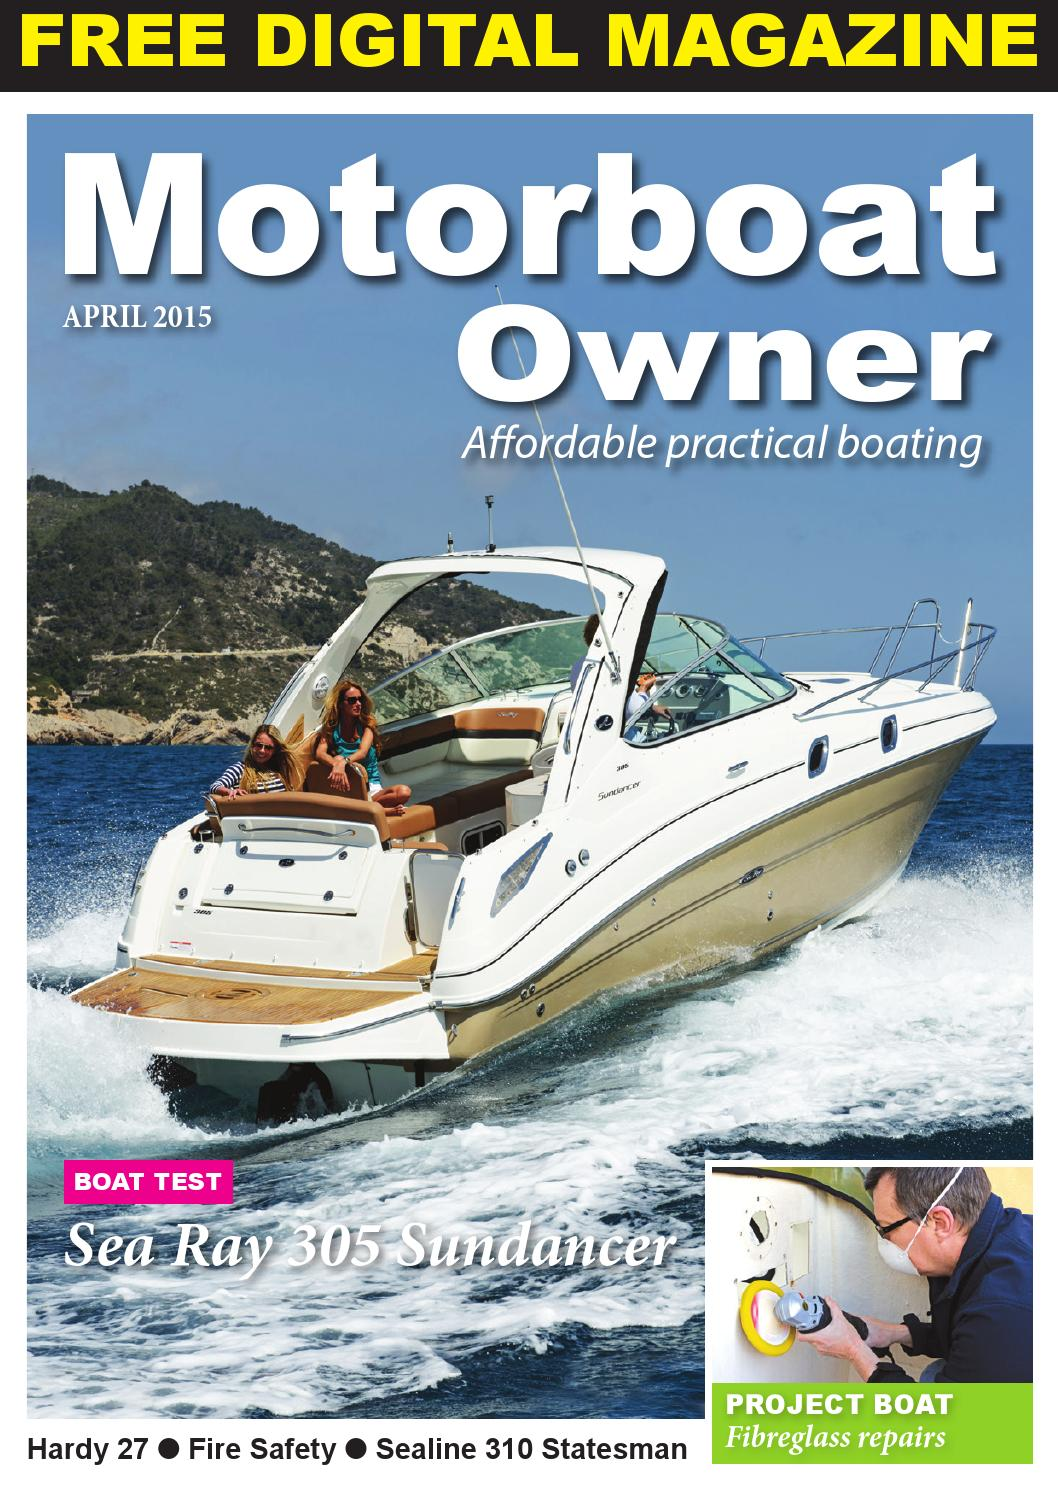 Motorboat Owner April 2015 By Digital Marine Media Ltd Issuu Adverc Wiring Diagram